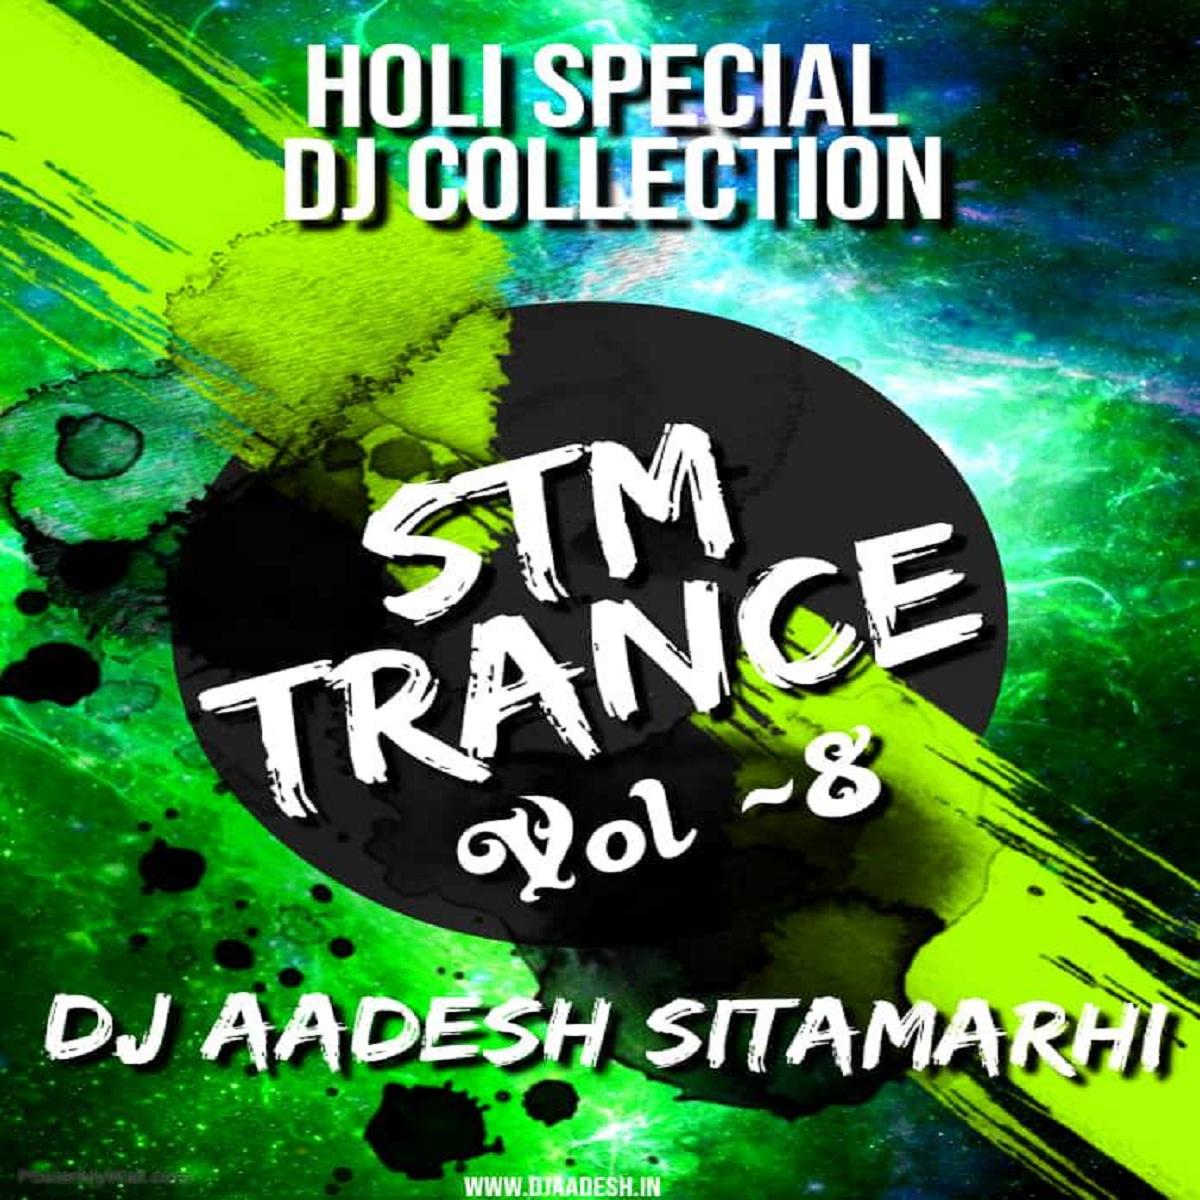 STM Trance Vol.08 - DJ Aadesh Sitamarhi